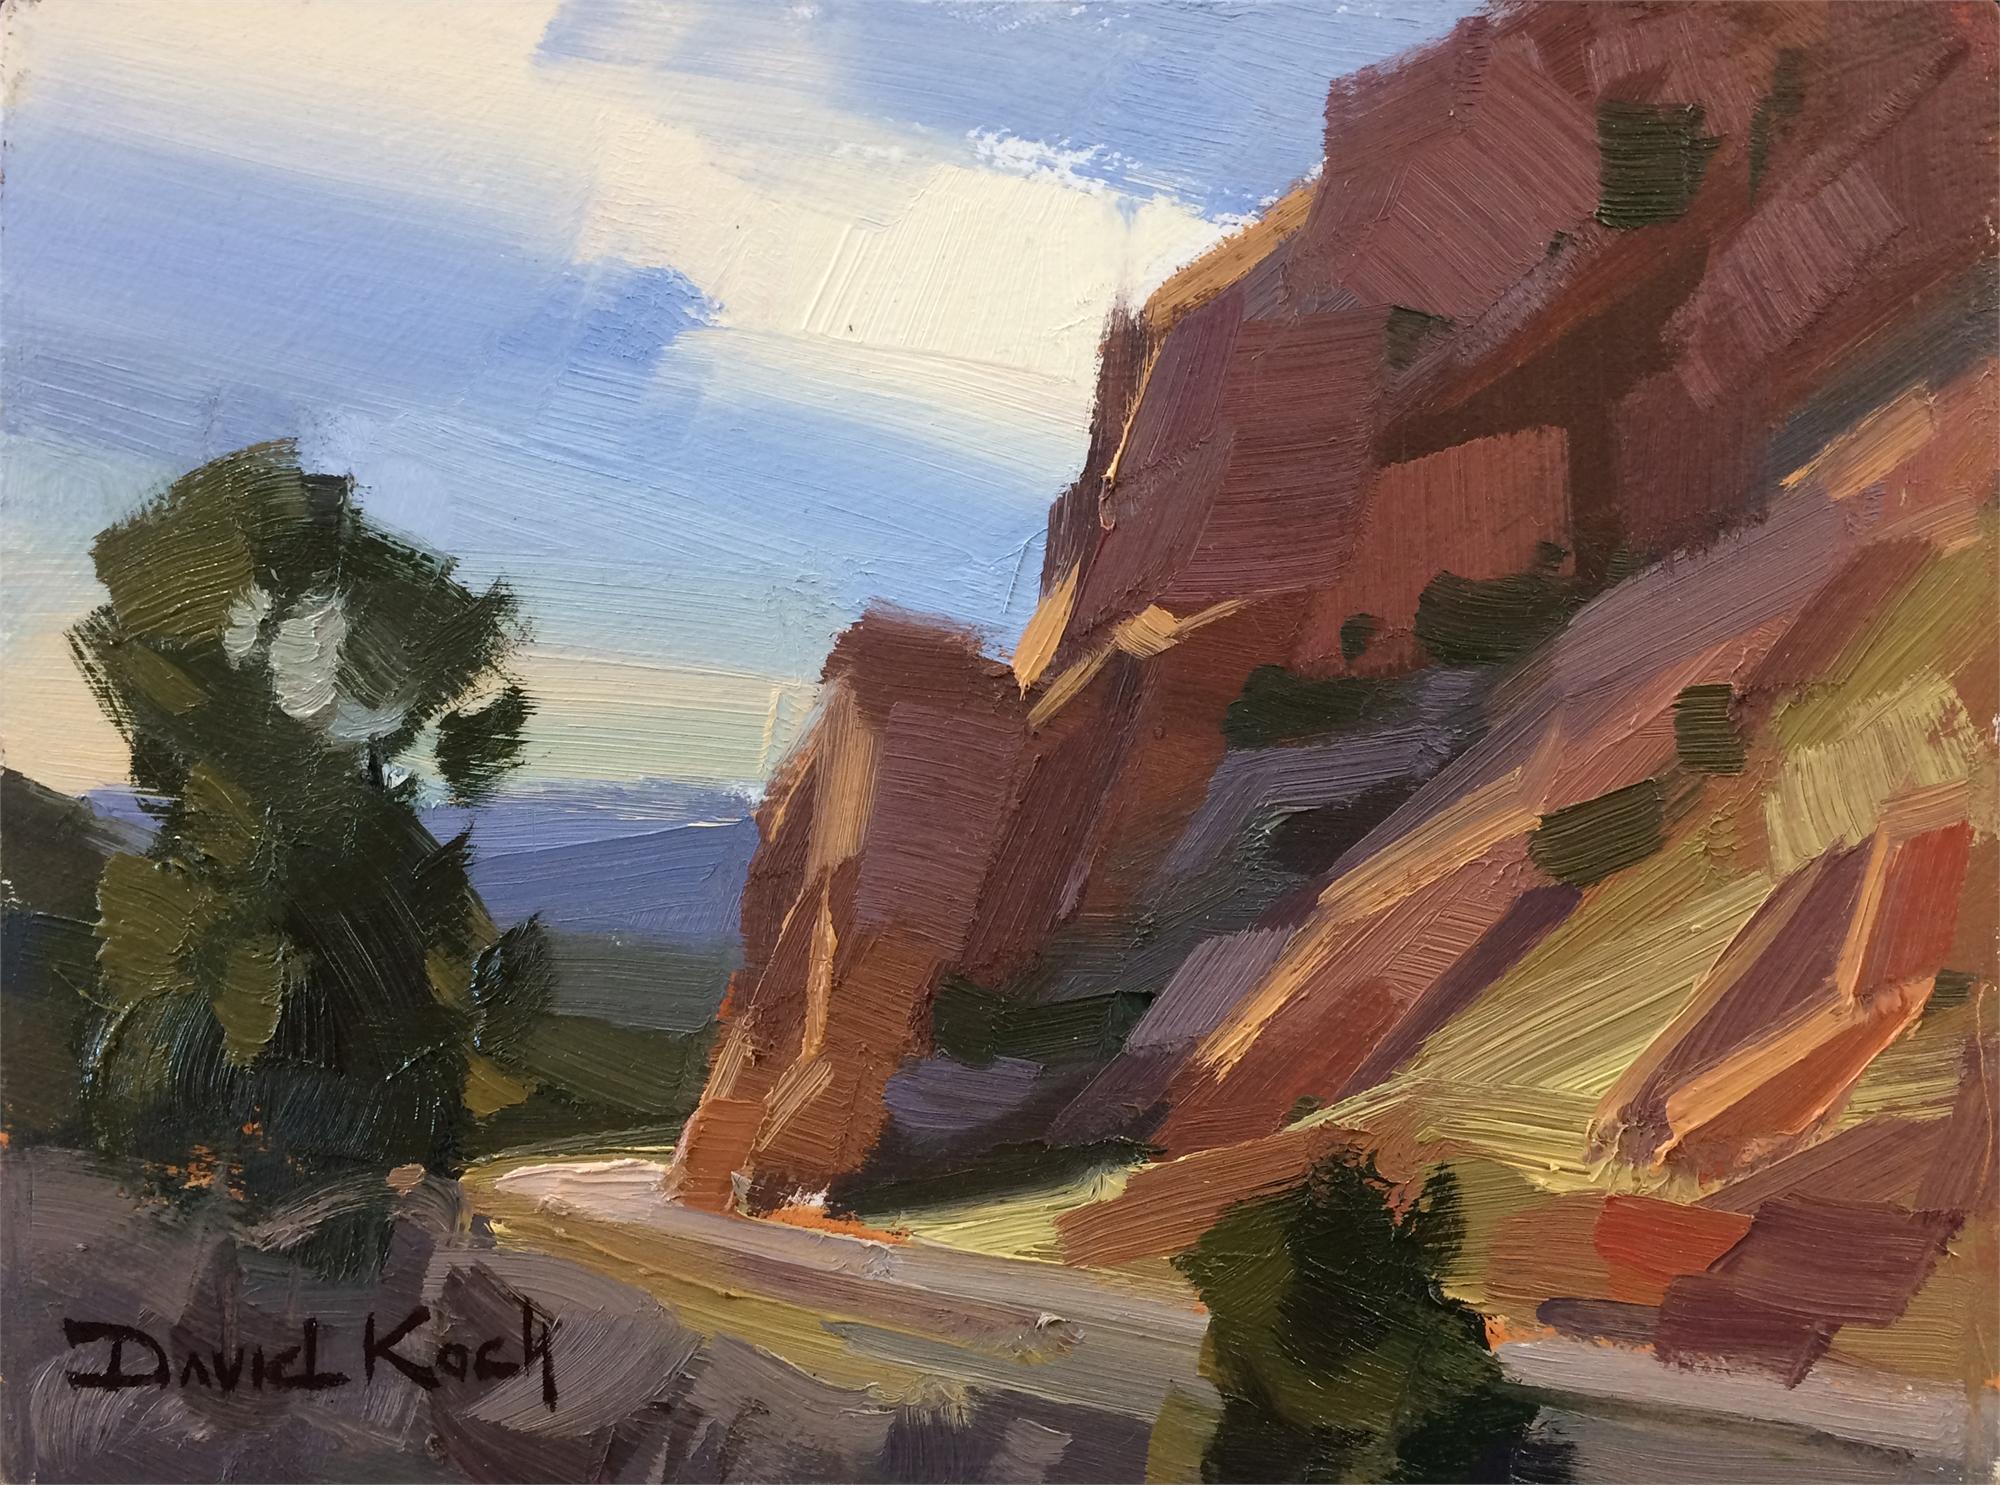 Cedar Canyon by David Koch